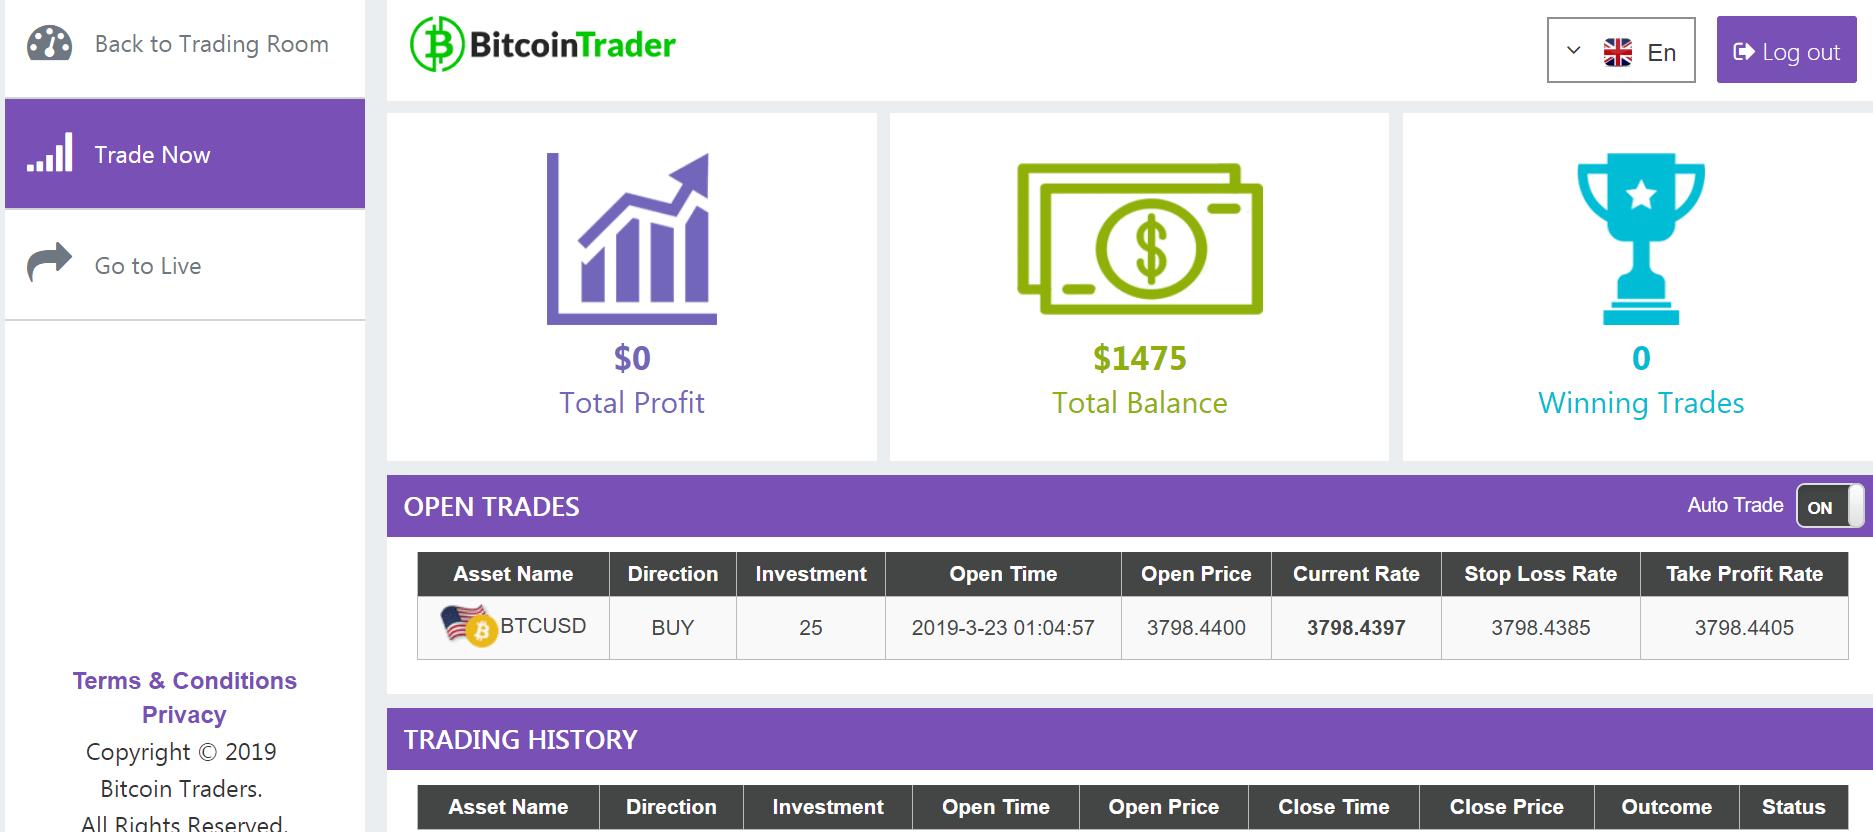 coinbase scam or legit